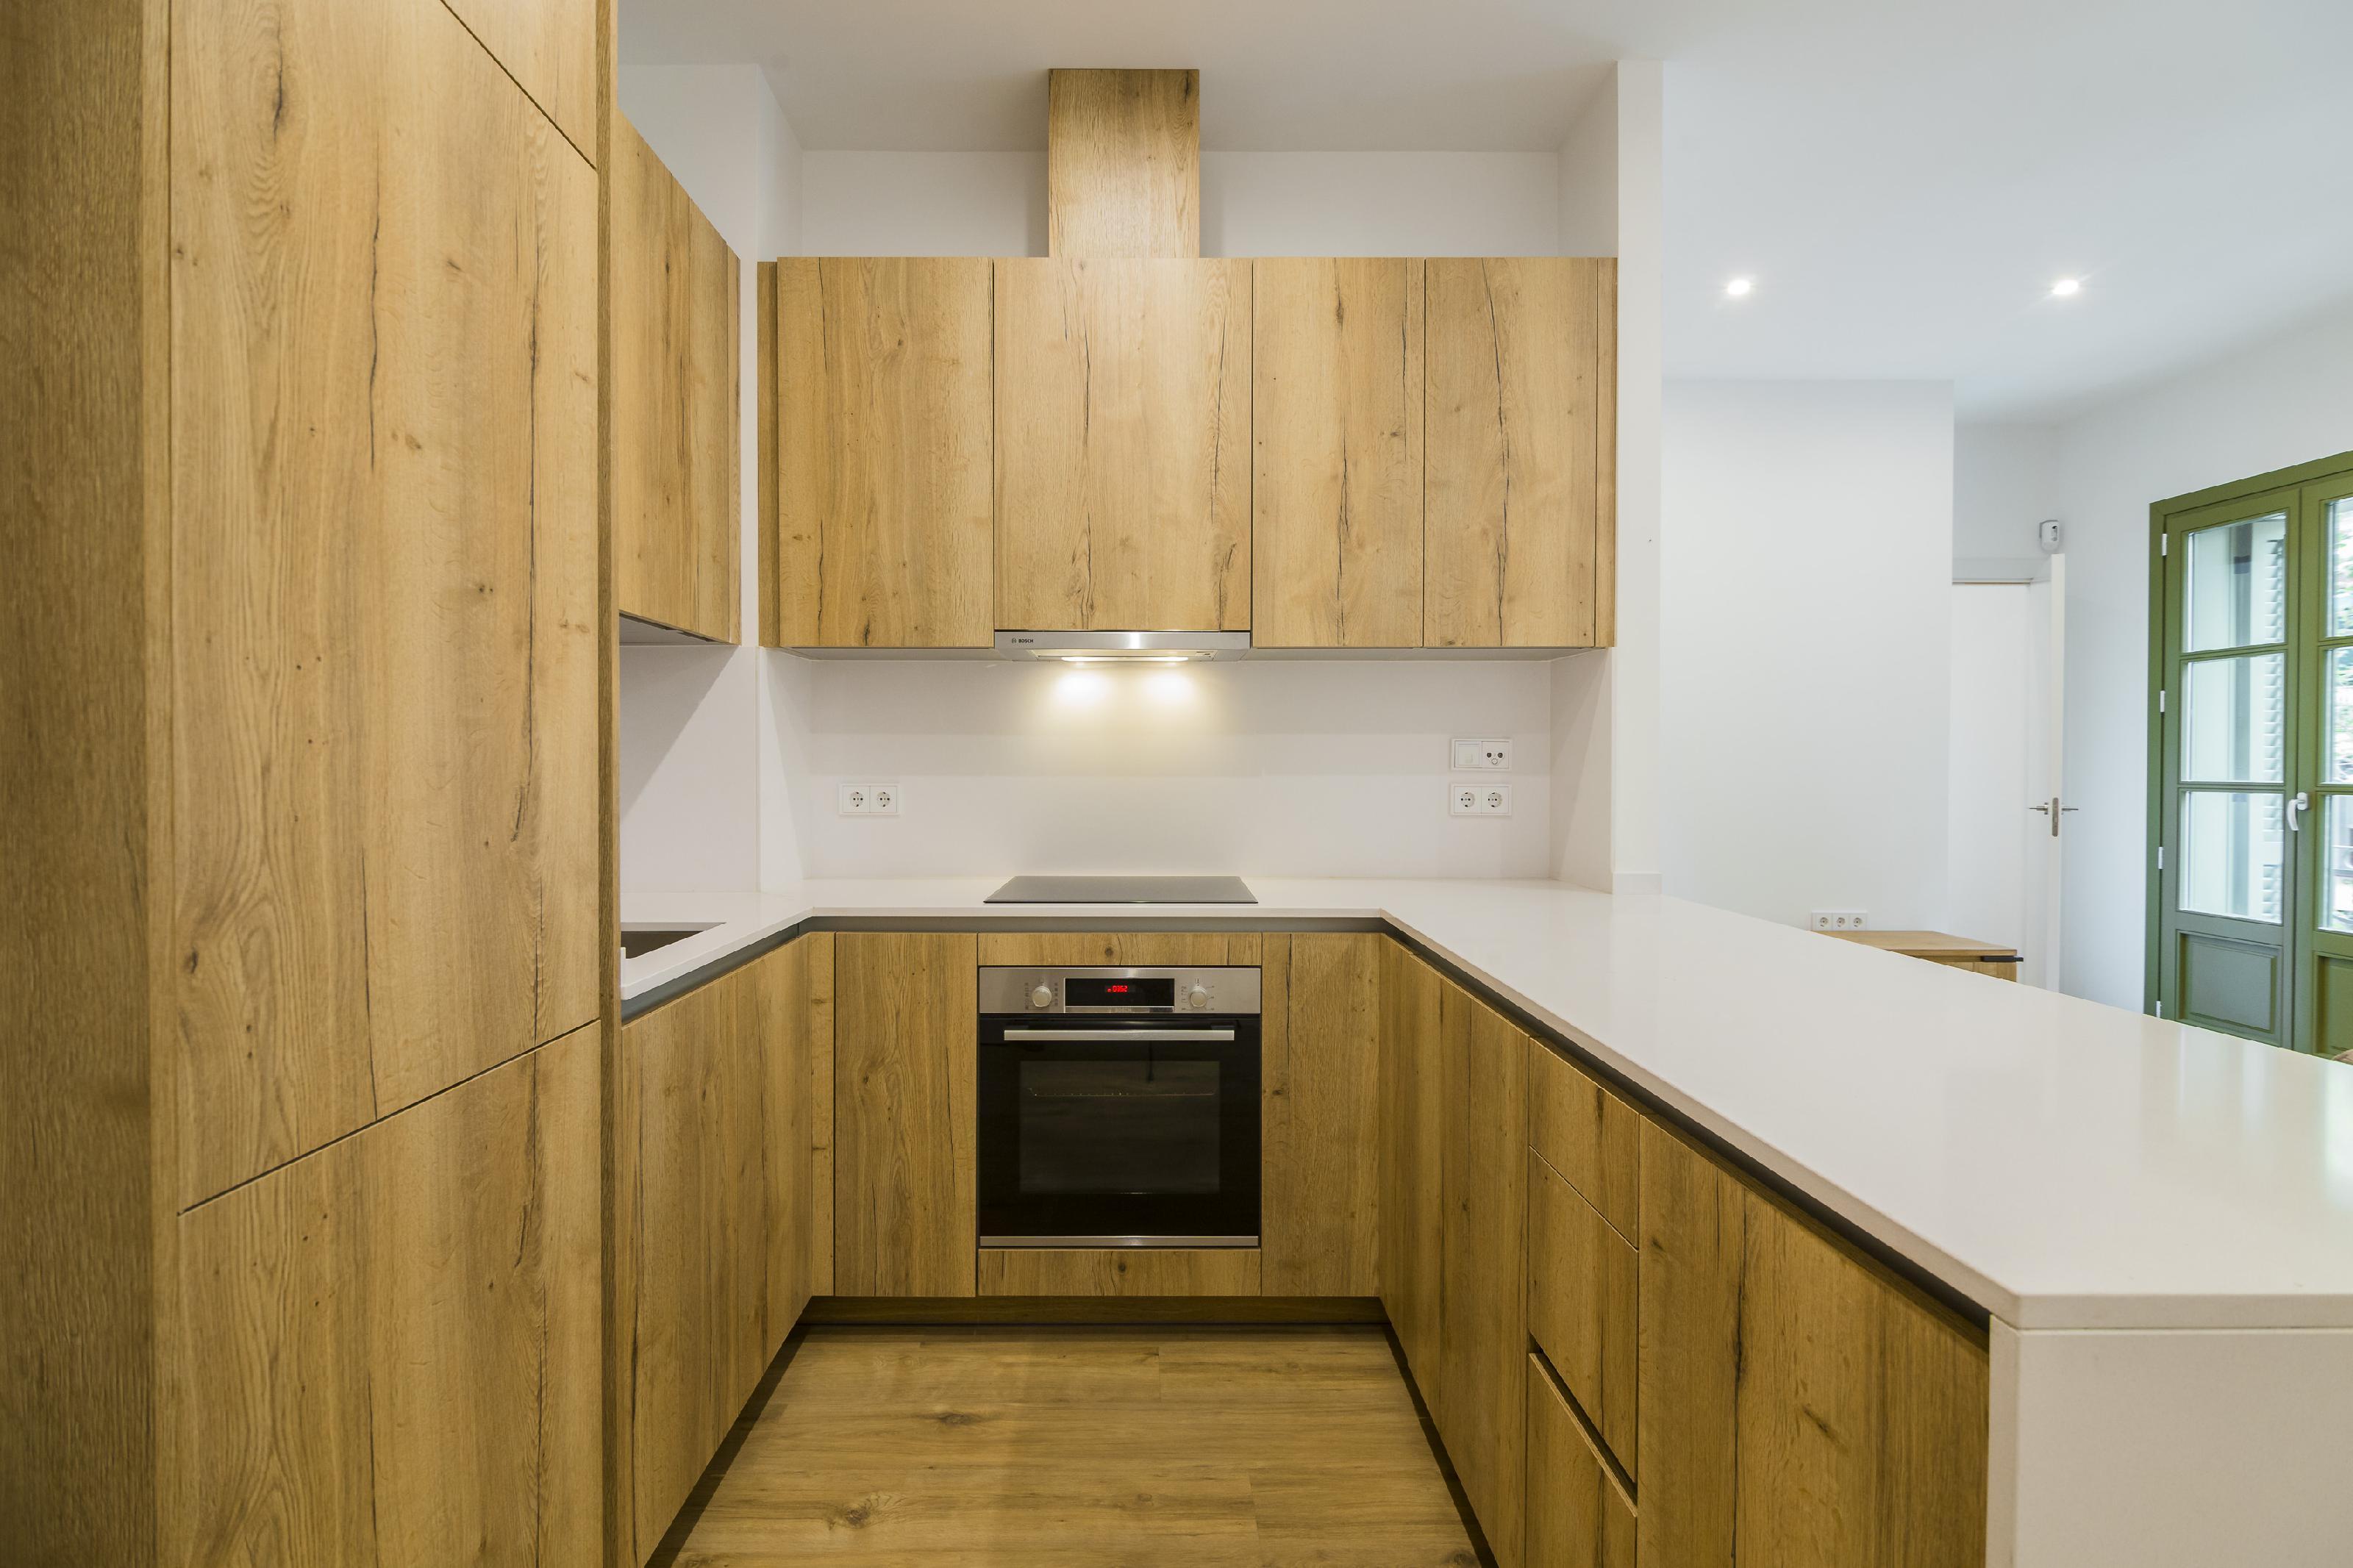 249857 Flat for sale in Eixample, Nova Esquerra Eixample 8